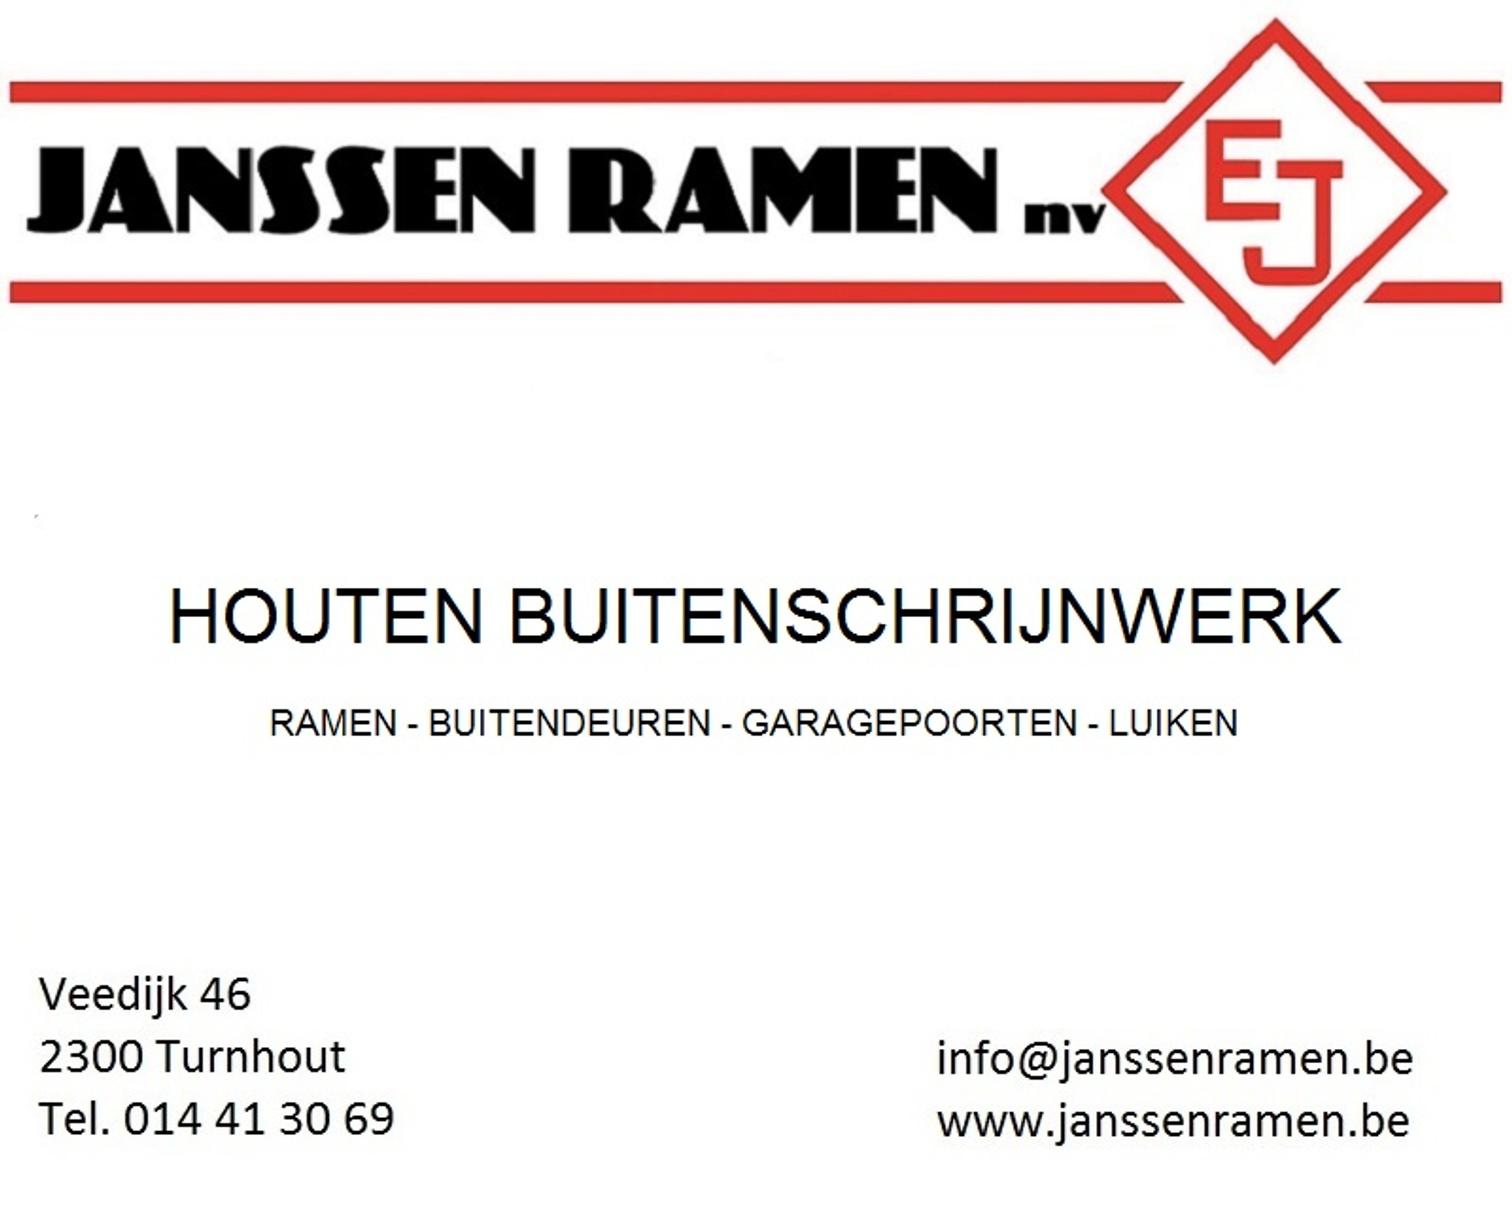 Janssen Ramen NV logo